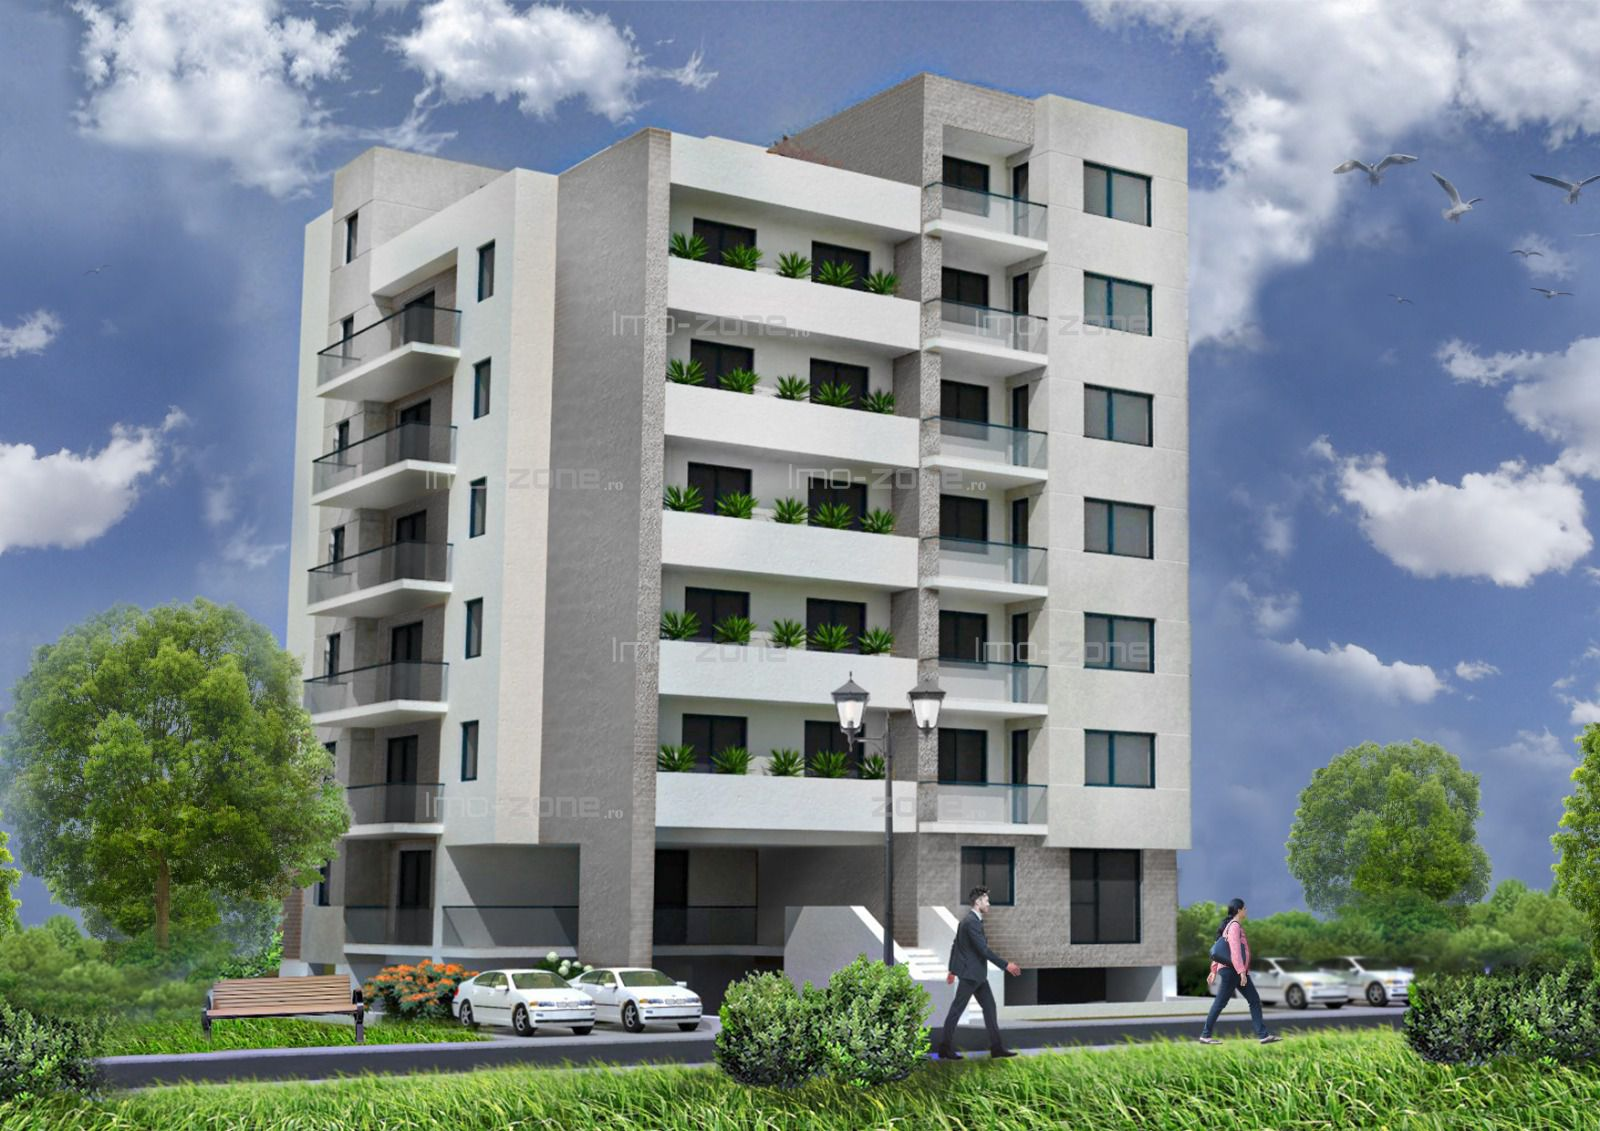 Apartament cu 2 camere, spatios, 55 mp, BLOC NOU, FINISAT MODERN, COMISION 0%